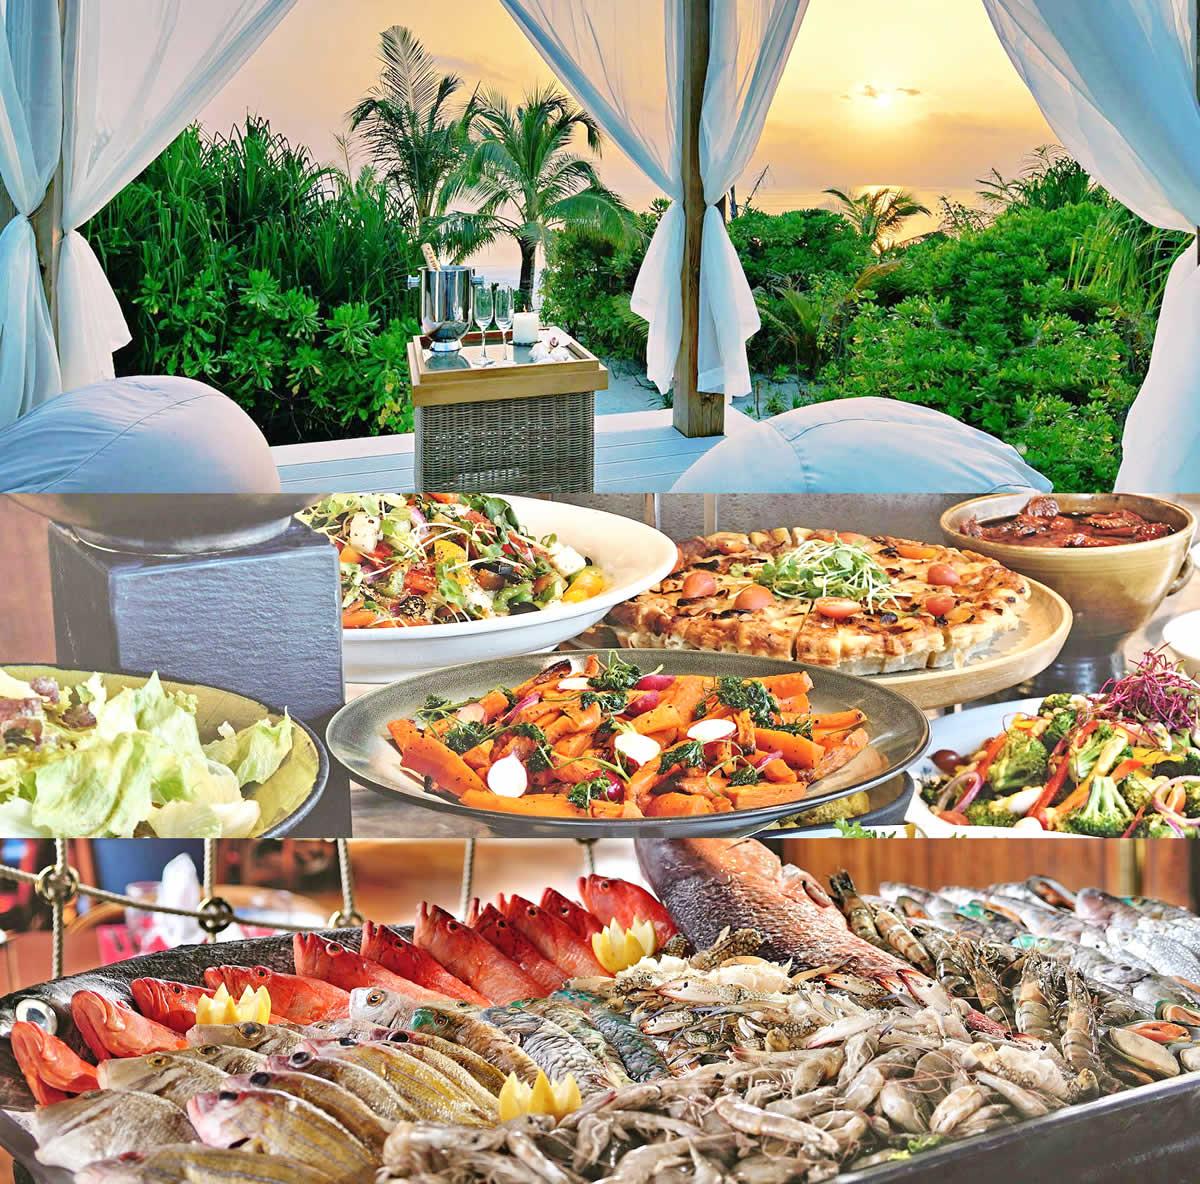 Mӧvenpick Resort Kuredhivaru Maldives restaurants and fine dining options